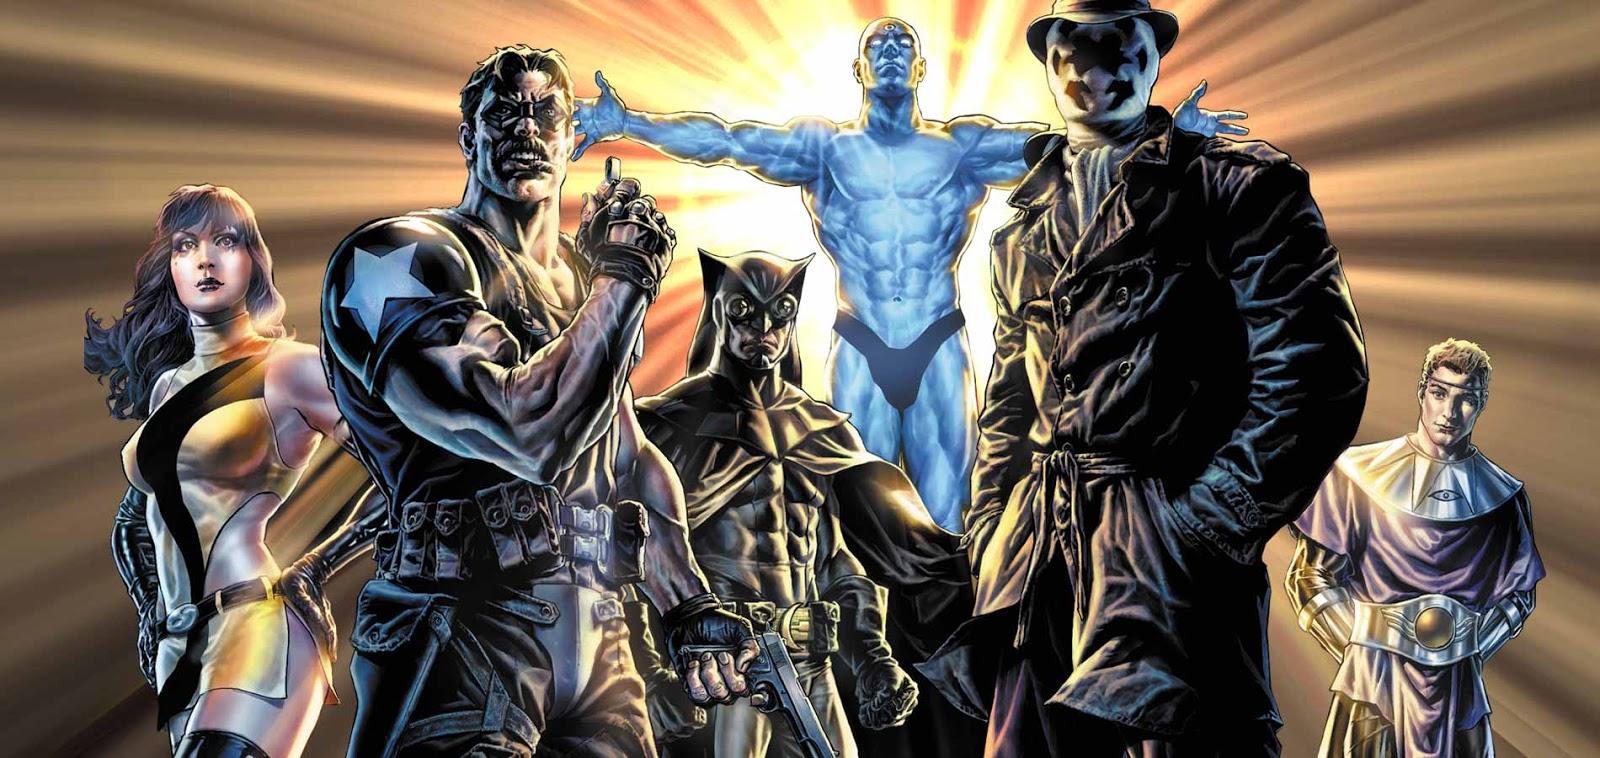 HBO Green-lit Watchmen Pilot Episode.